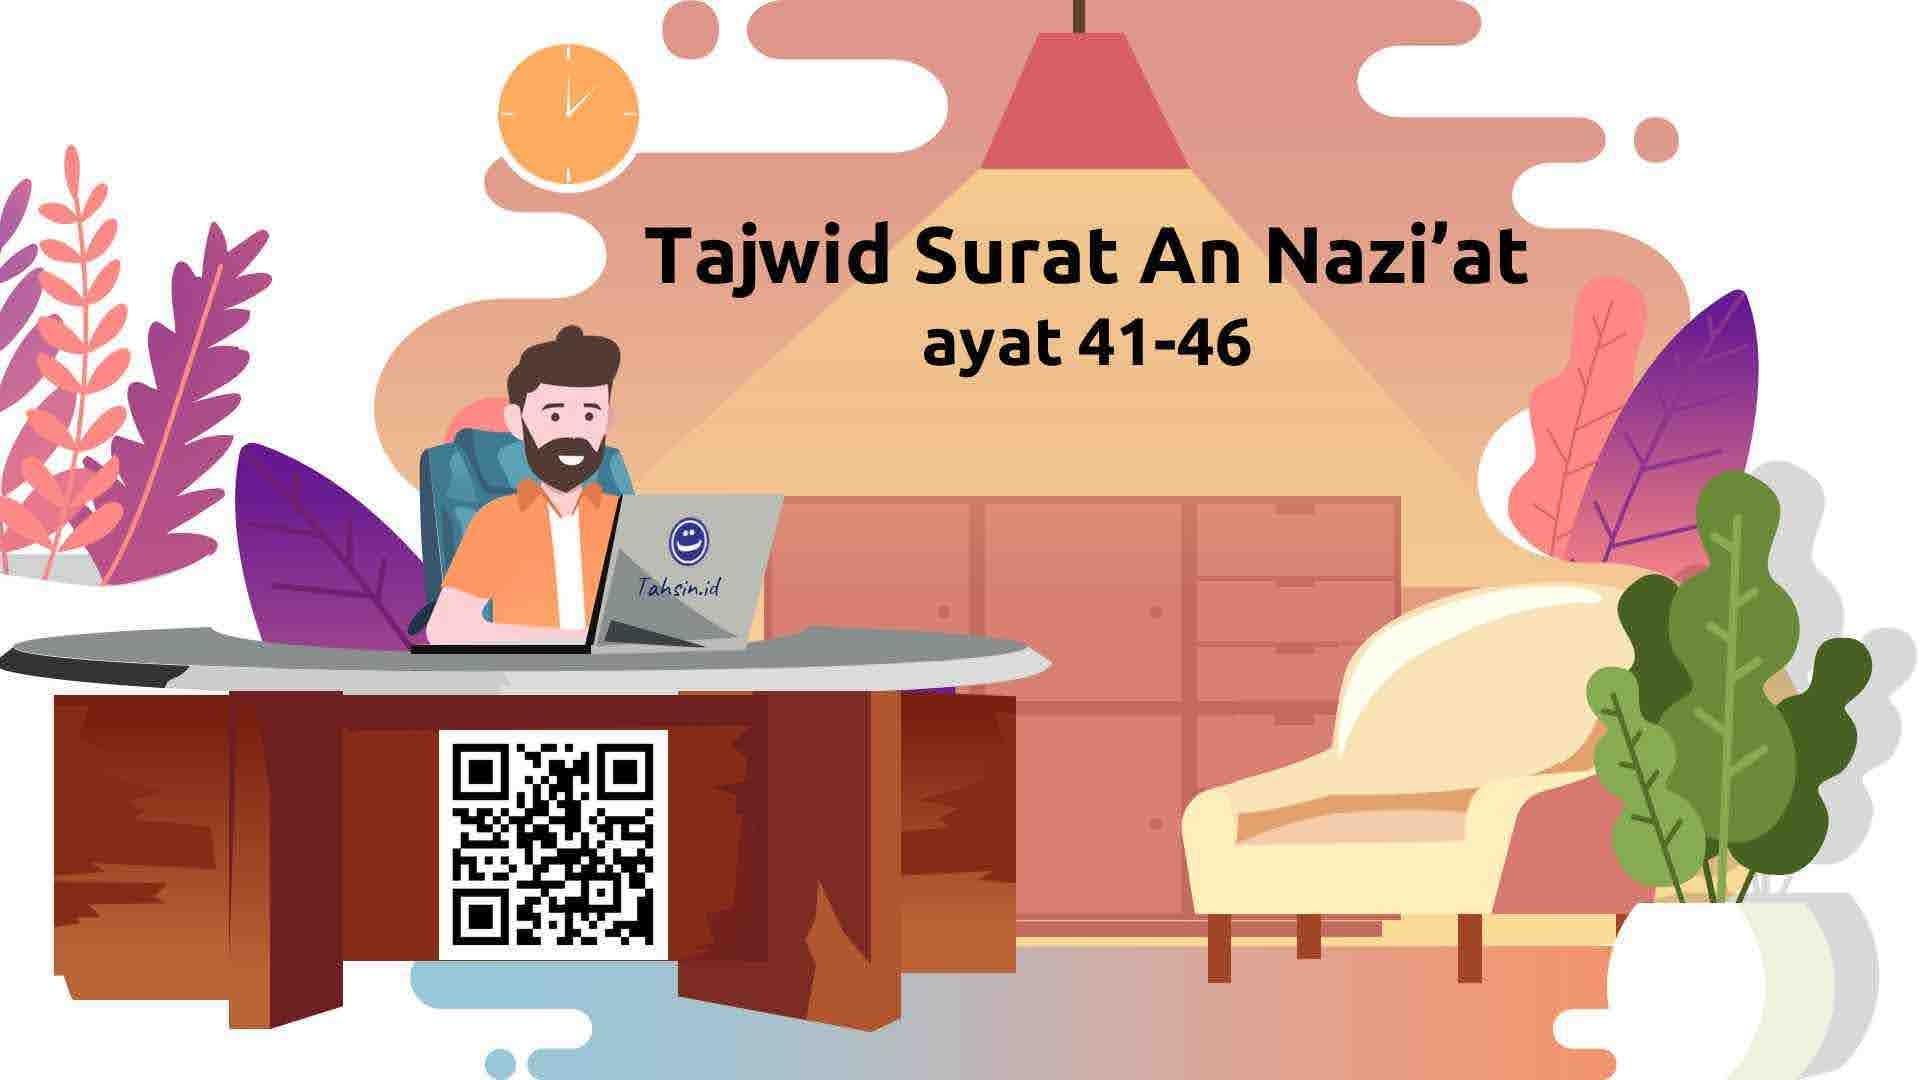 tajwid-surat-an-nazi'at-ayat-41-46